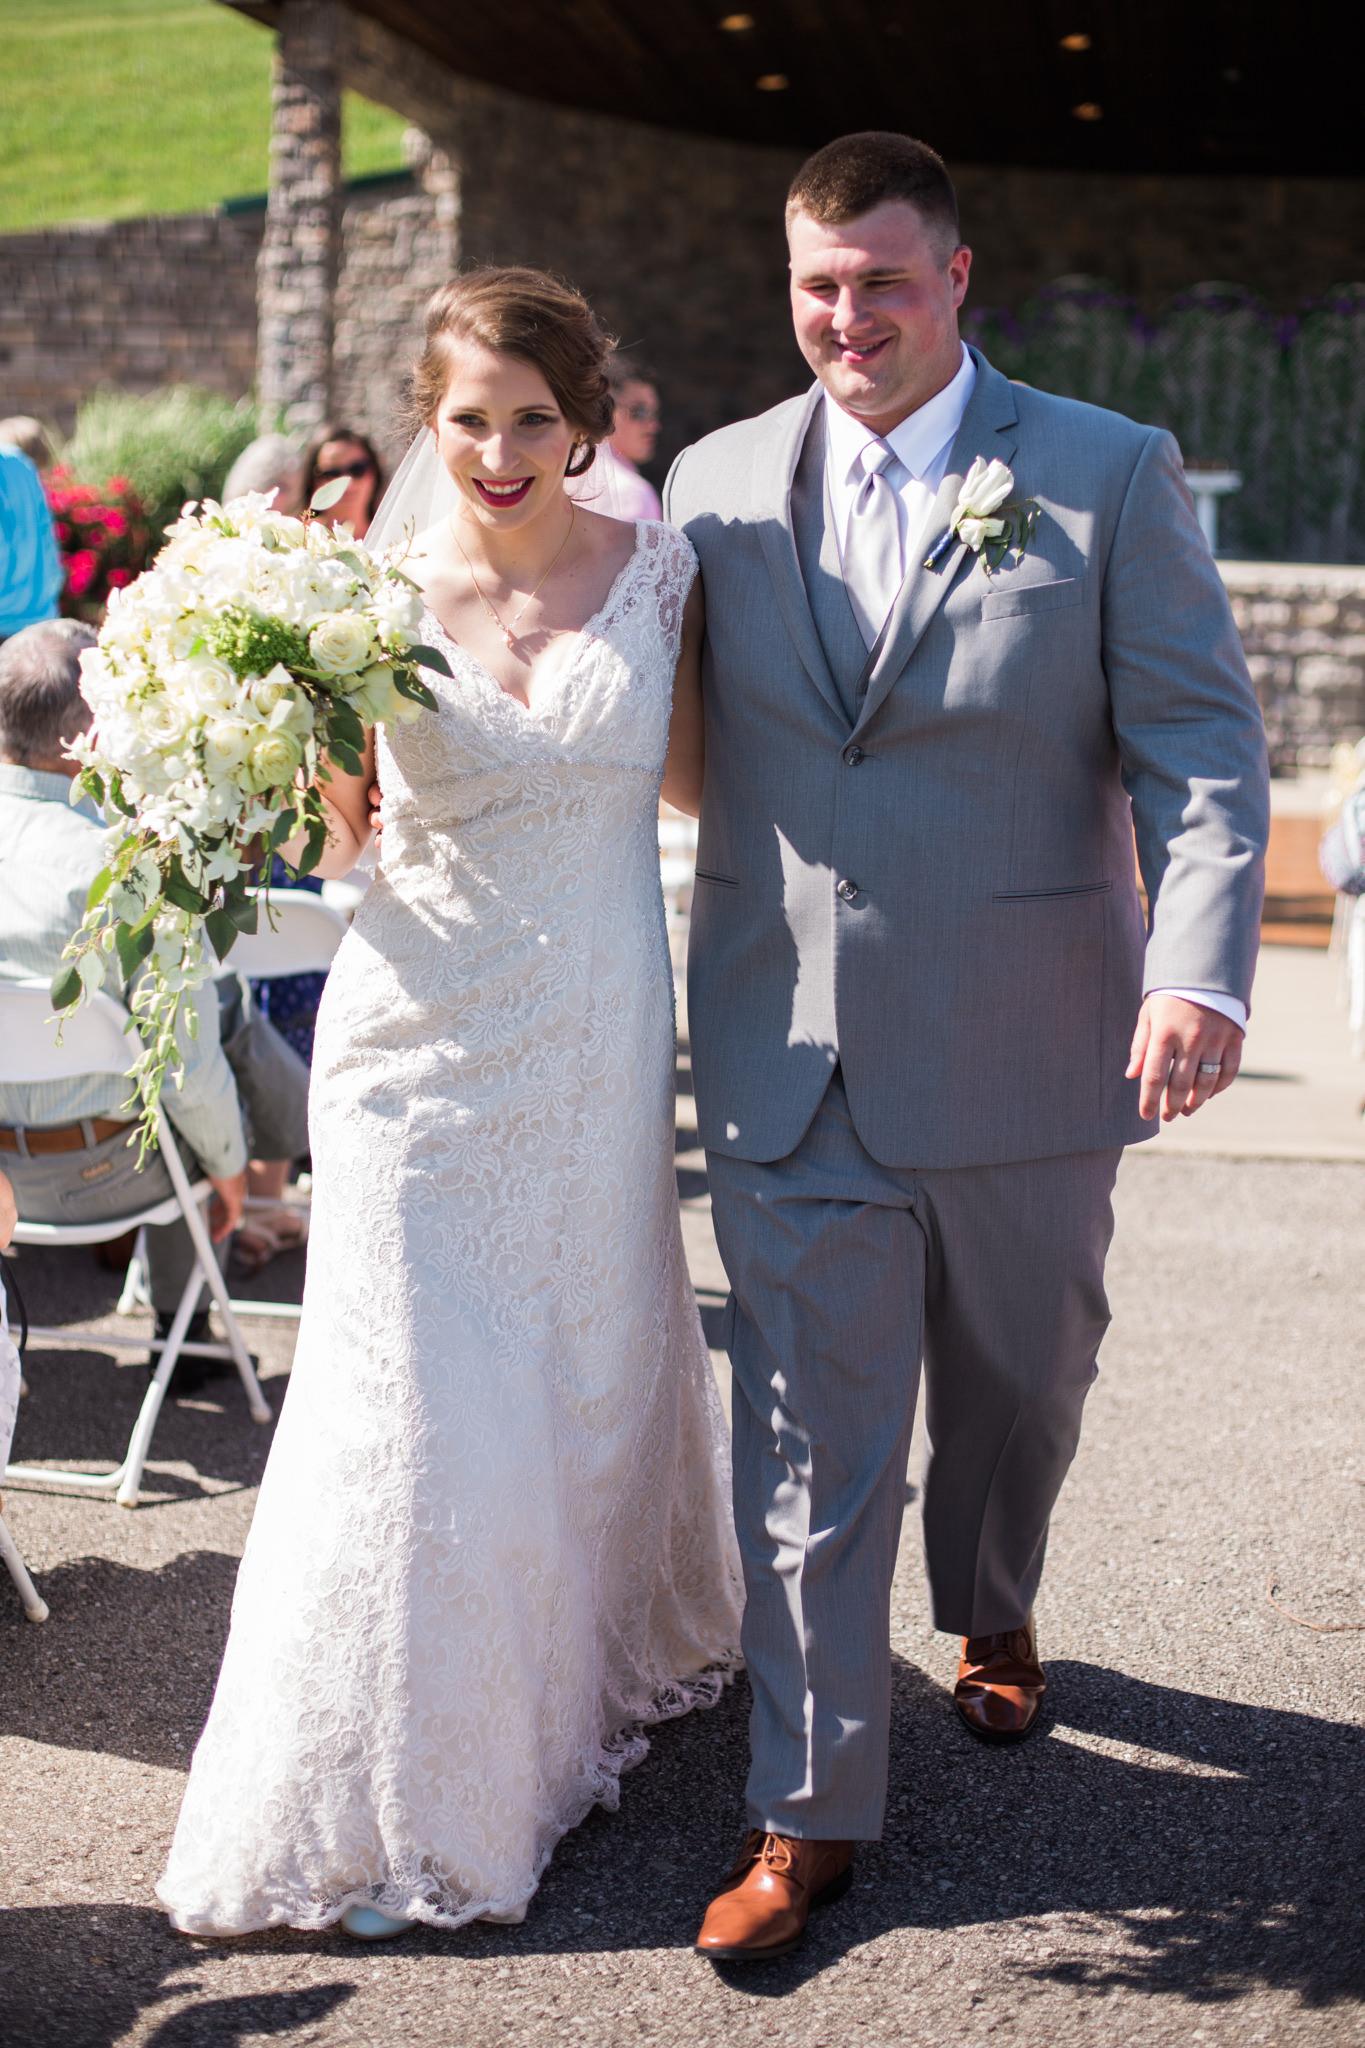 2017.06.03_Callie&Dustin_Wedding_Blog_0025.jpg